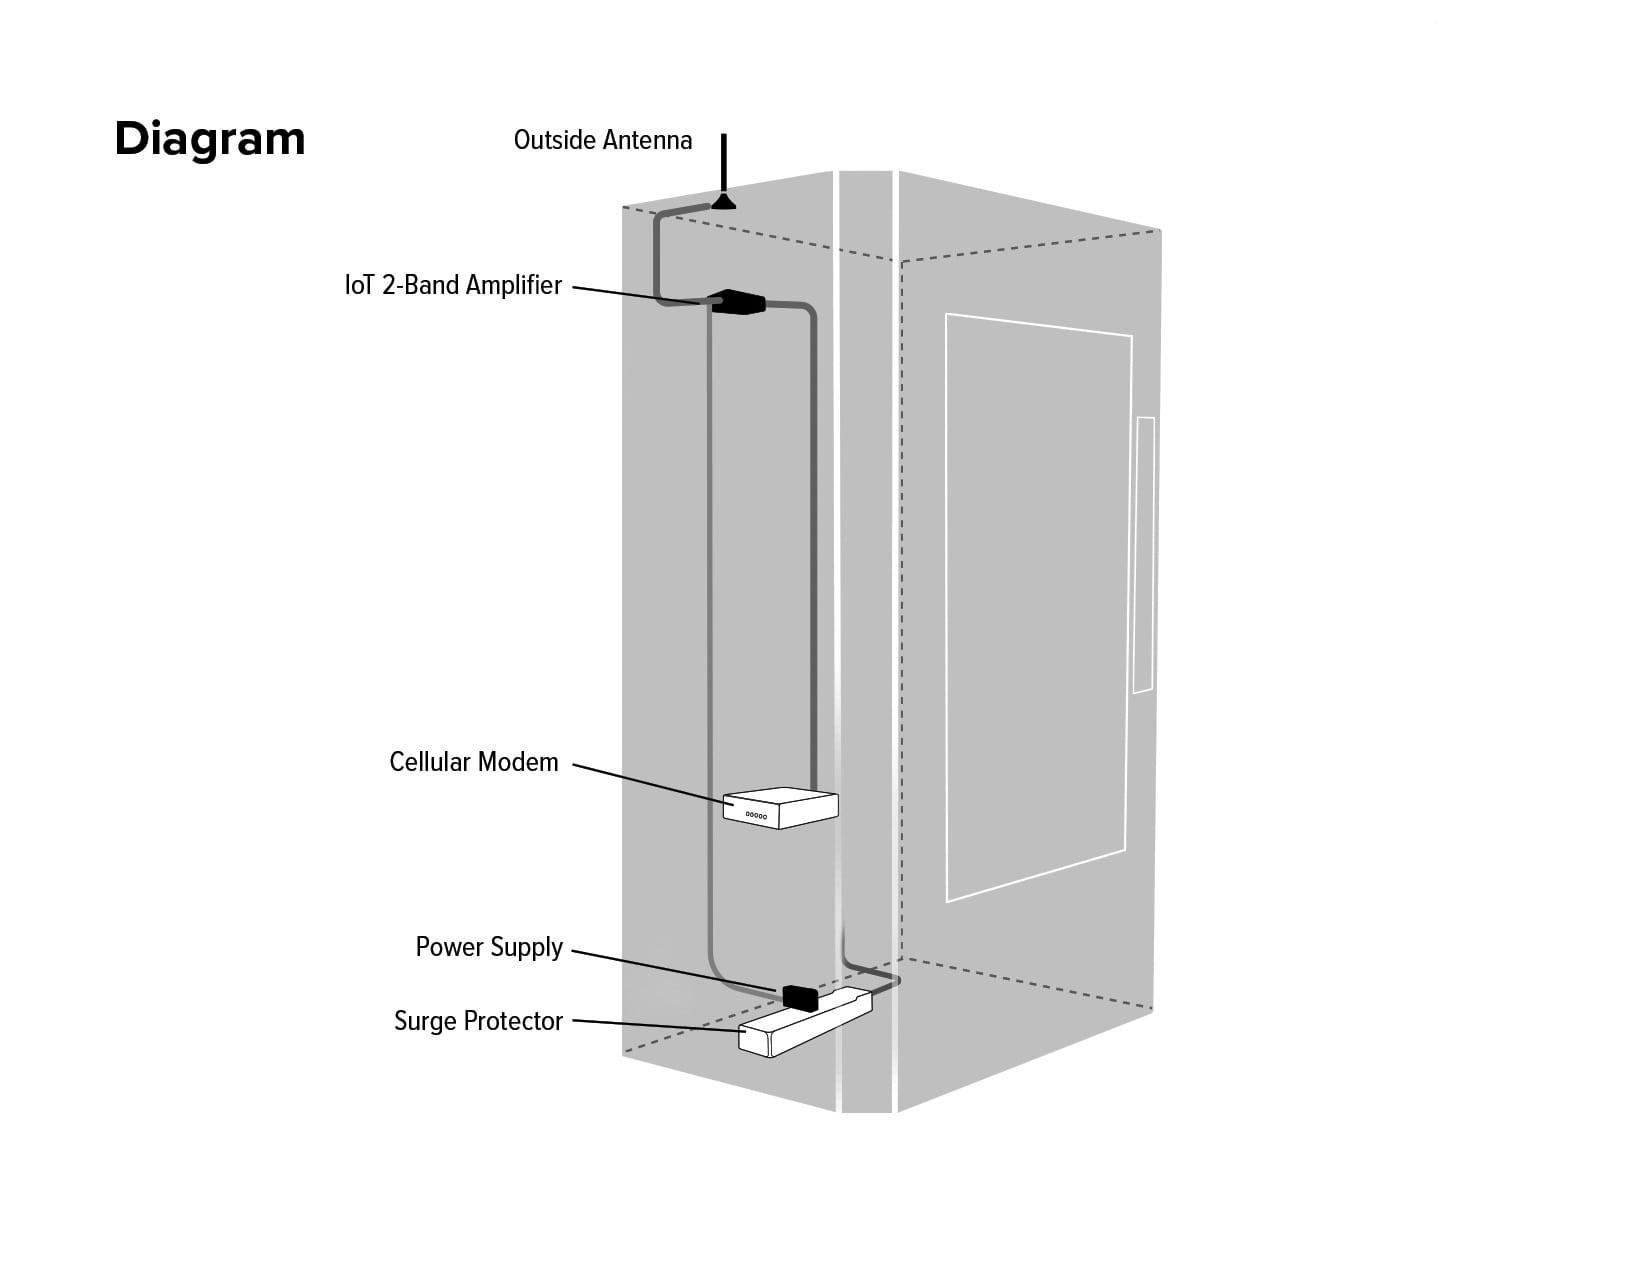 https://assets.wilsonelectronics.com/m/1b4933895cc0862e/original/IoT_2-Band_Diagram-min.jpg